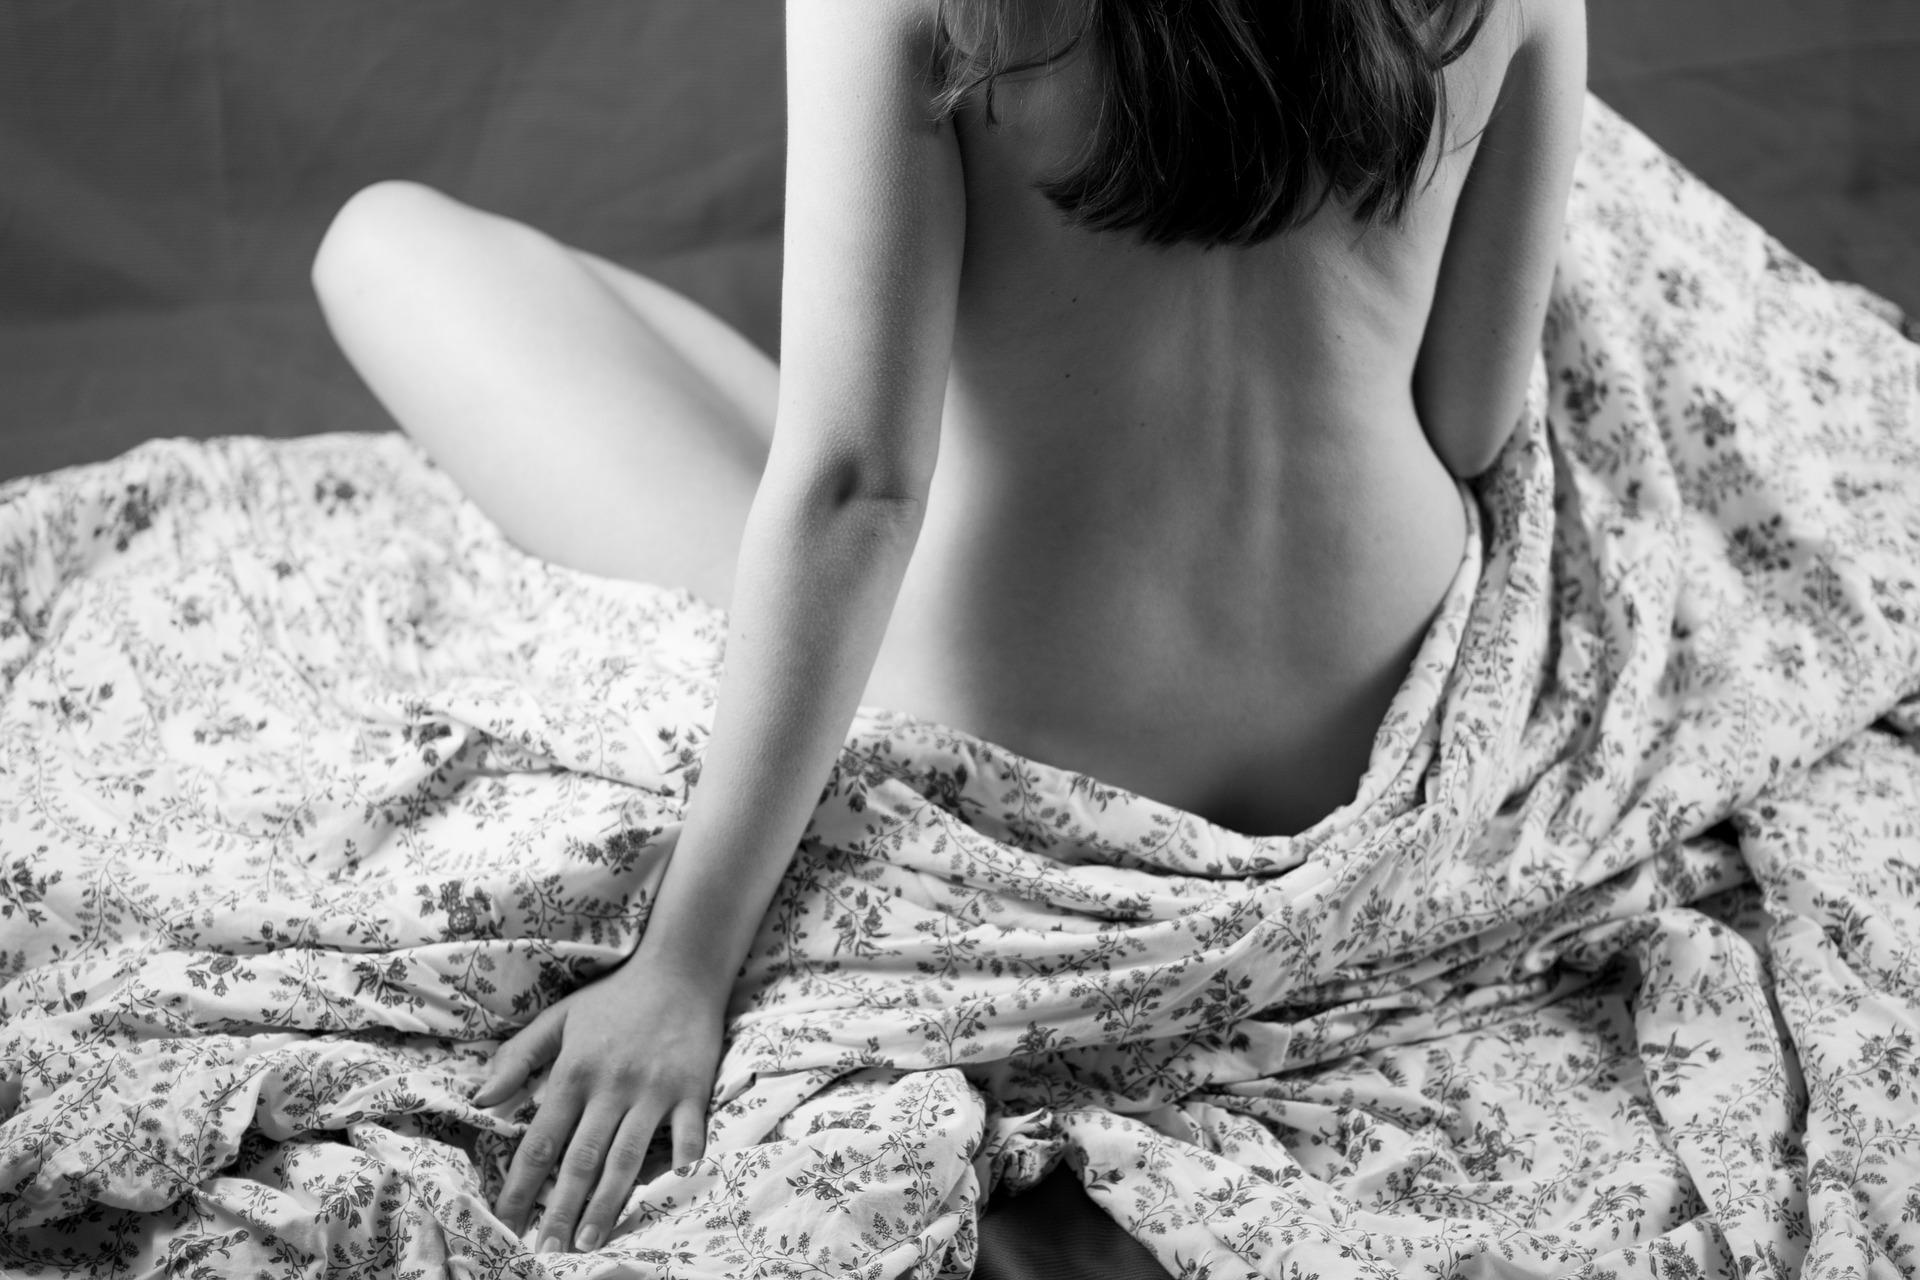 nude-woman-3797748_1920